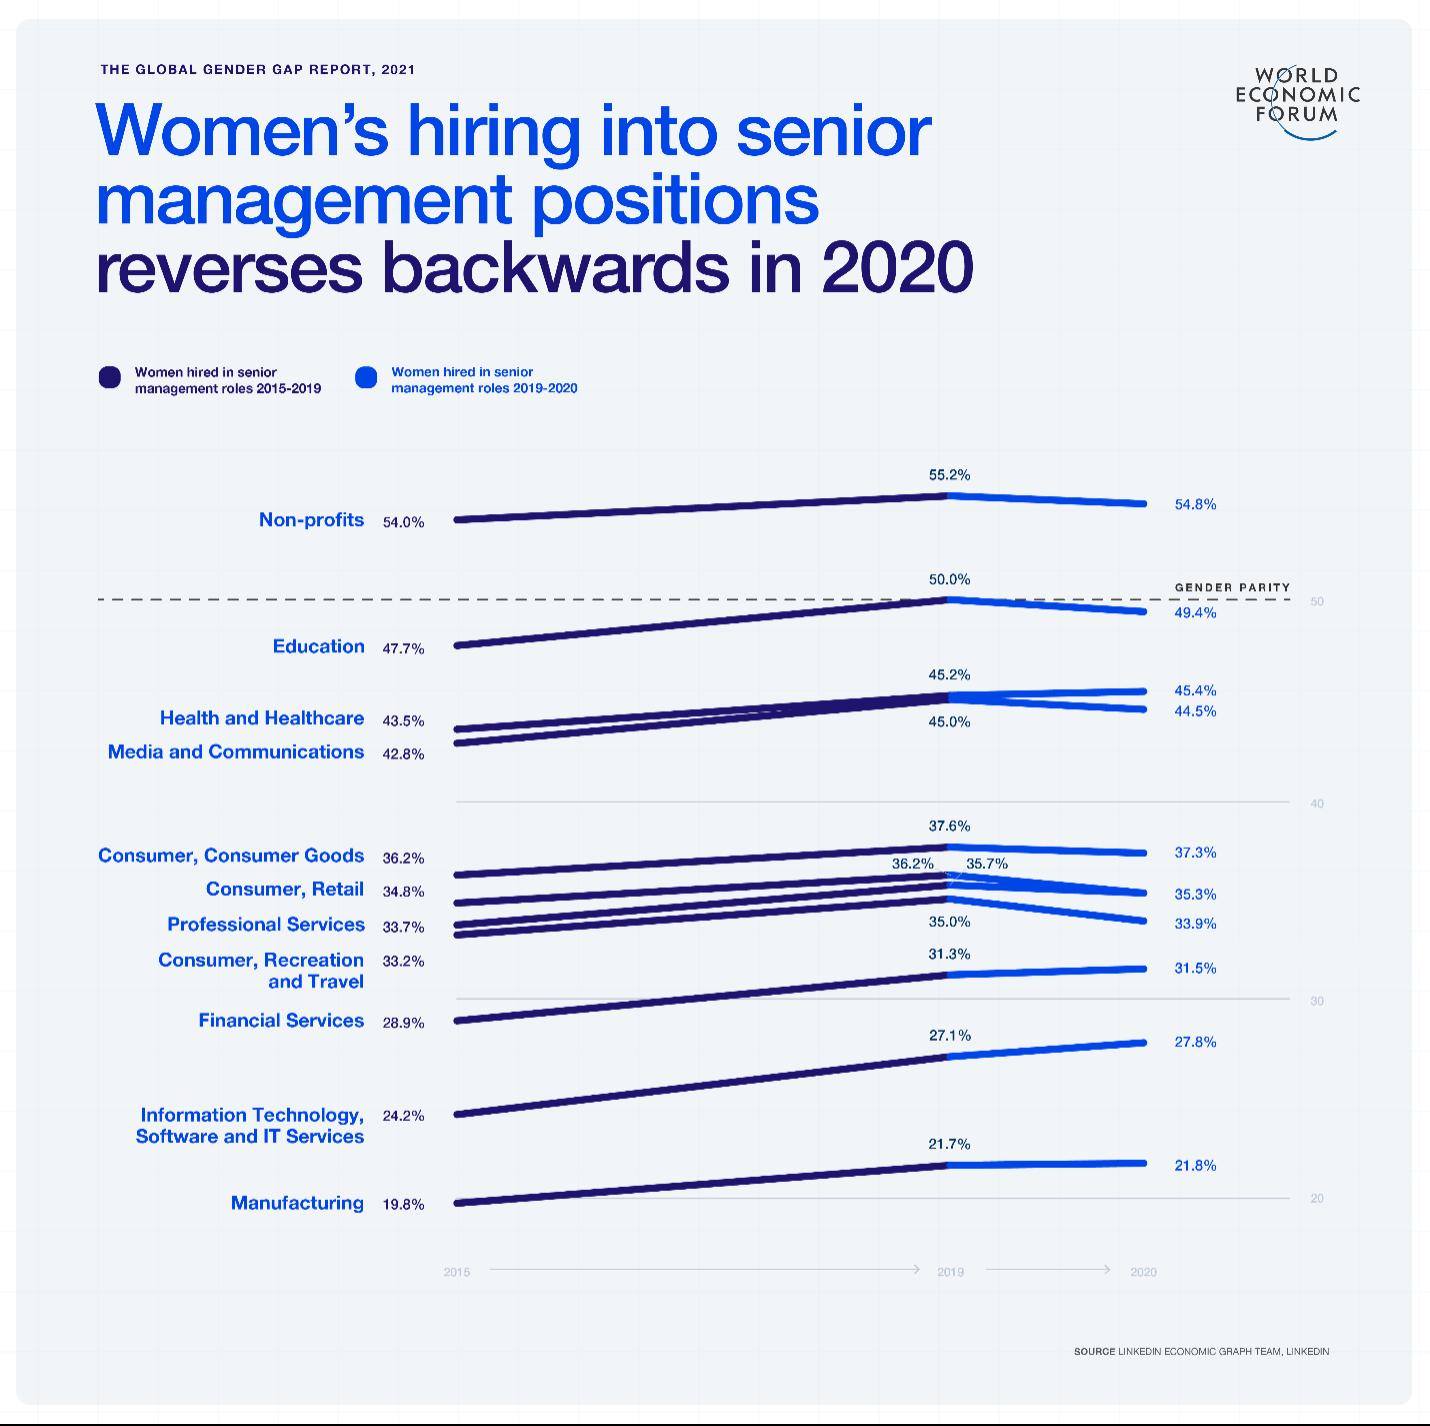 Global Gender Gap Report 2021 - women's hiring senior management roles in 2020